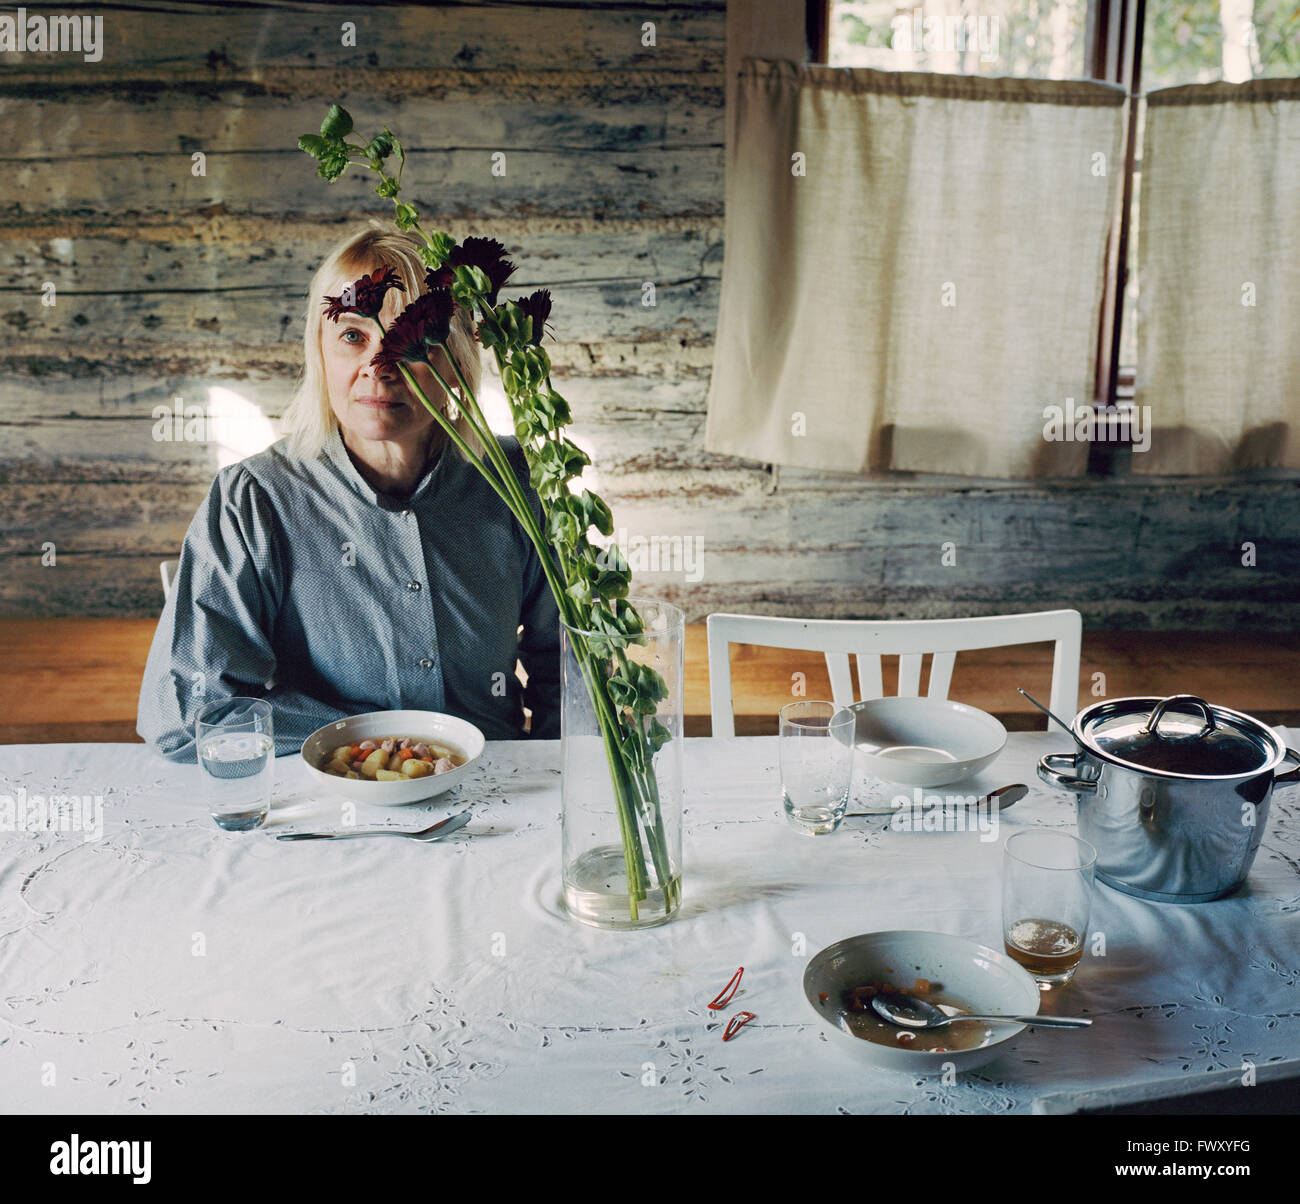 Finlandia, donna matura seduta a tavola Immagini Stock